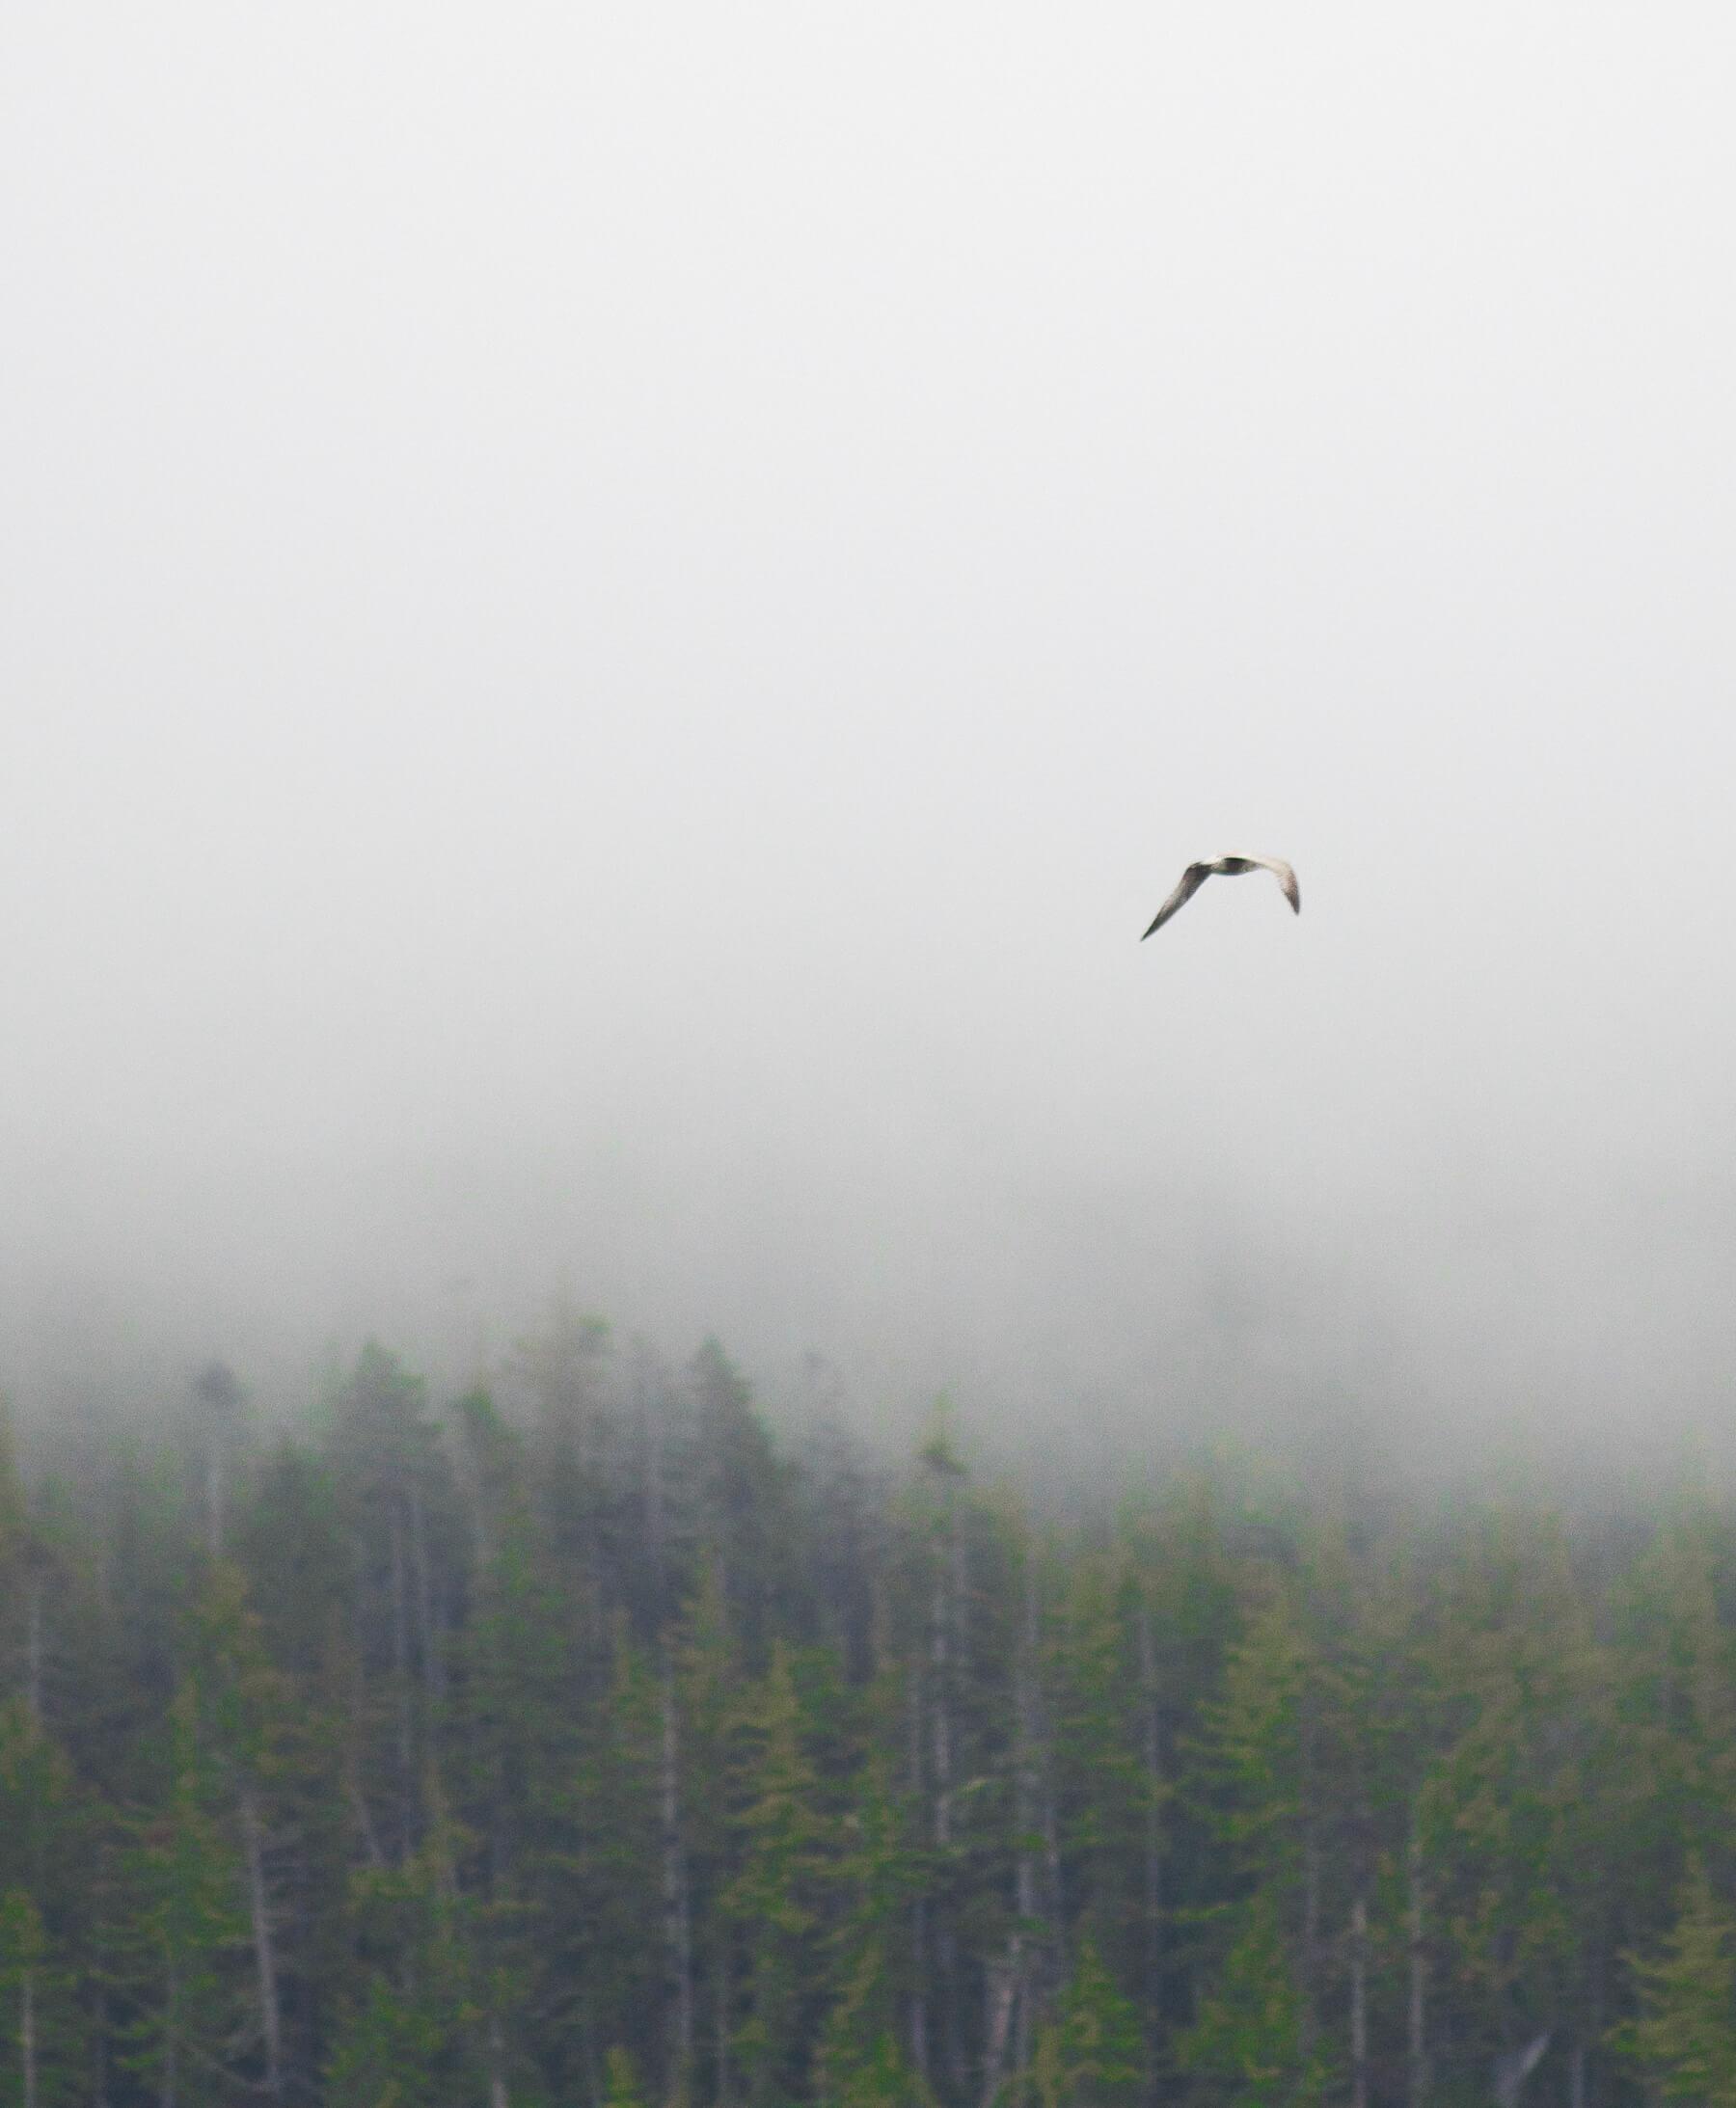 Seagull flying into fog